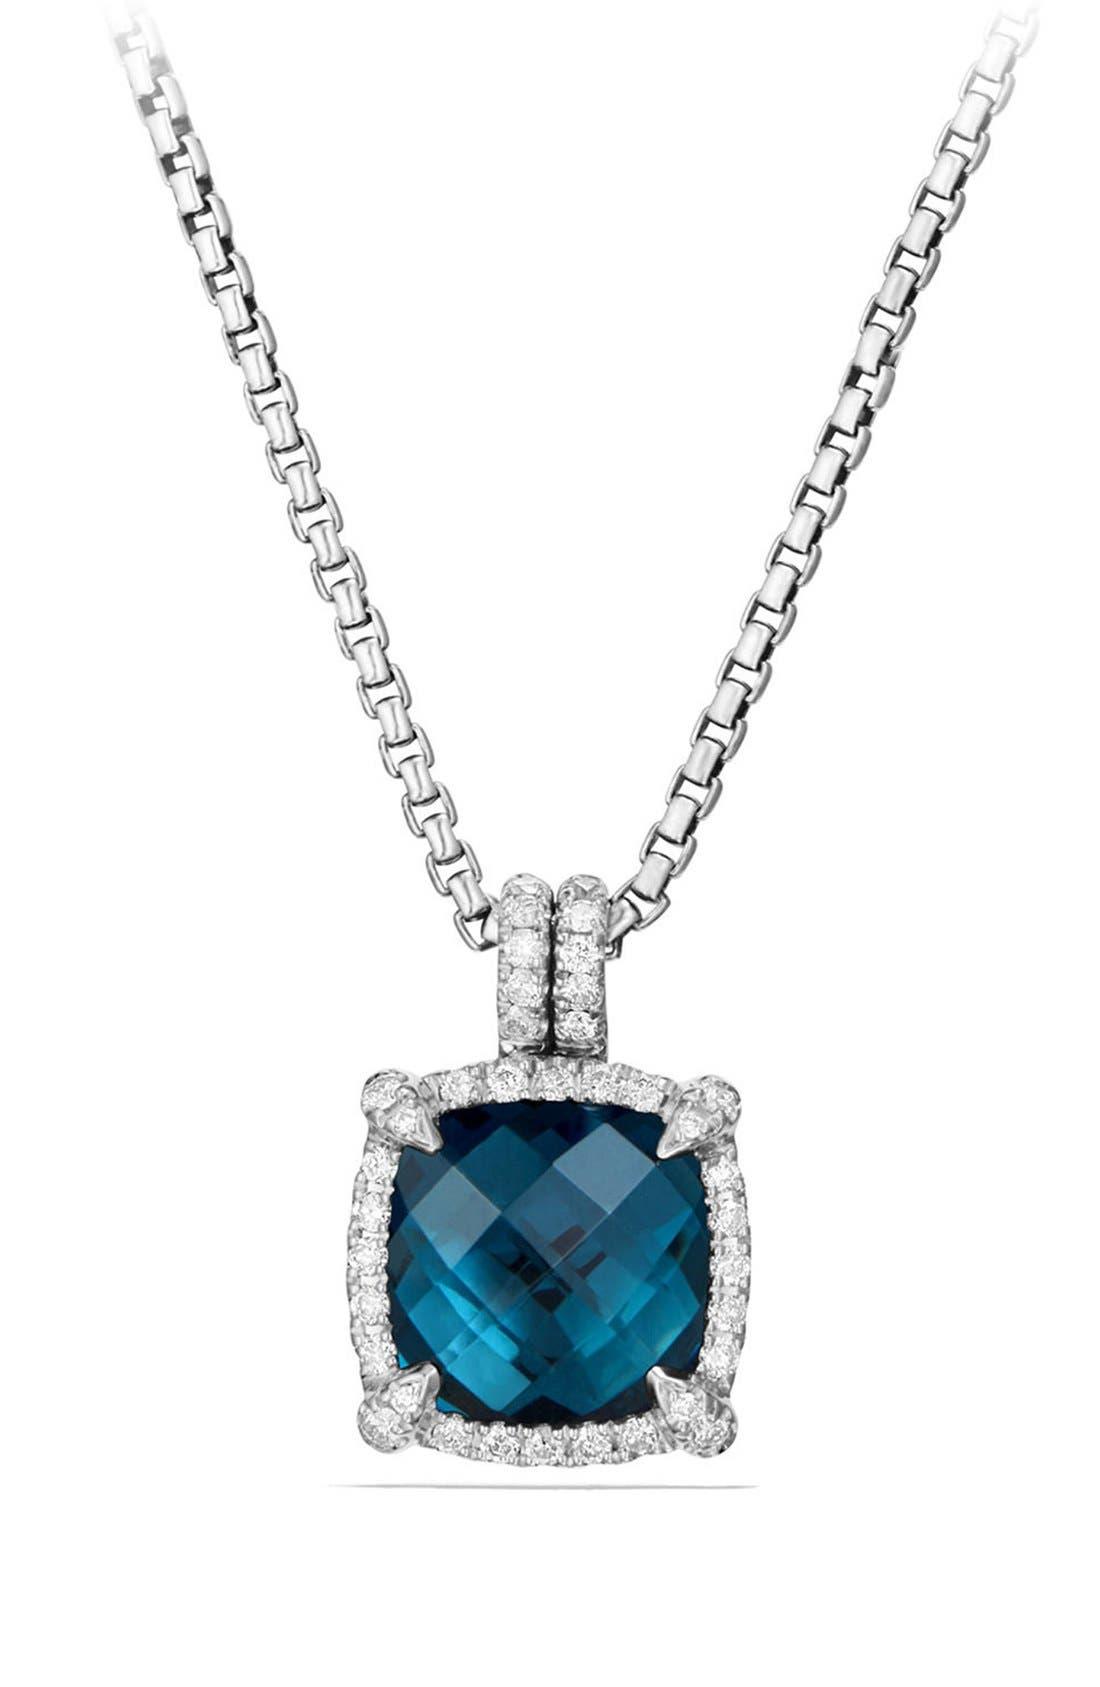 David Yurman 'Châtelaine' Small Pavé Bezel Pendant Necklace with Diamonds